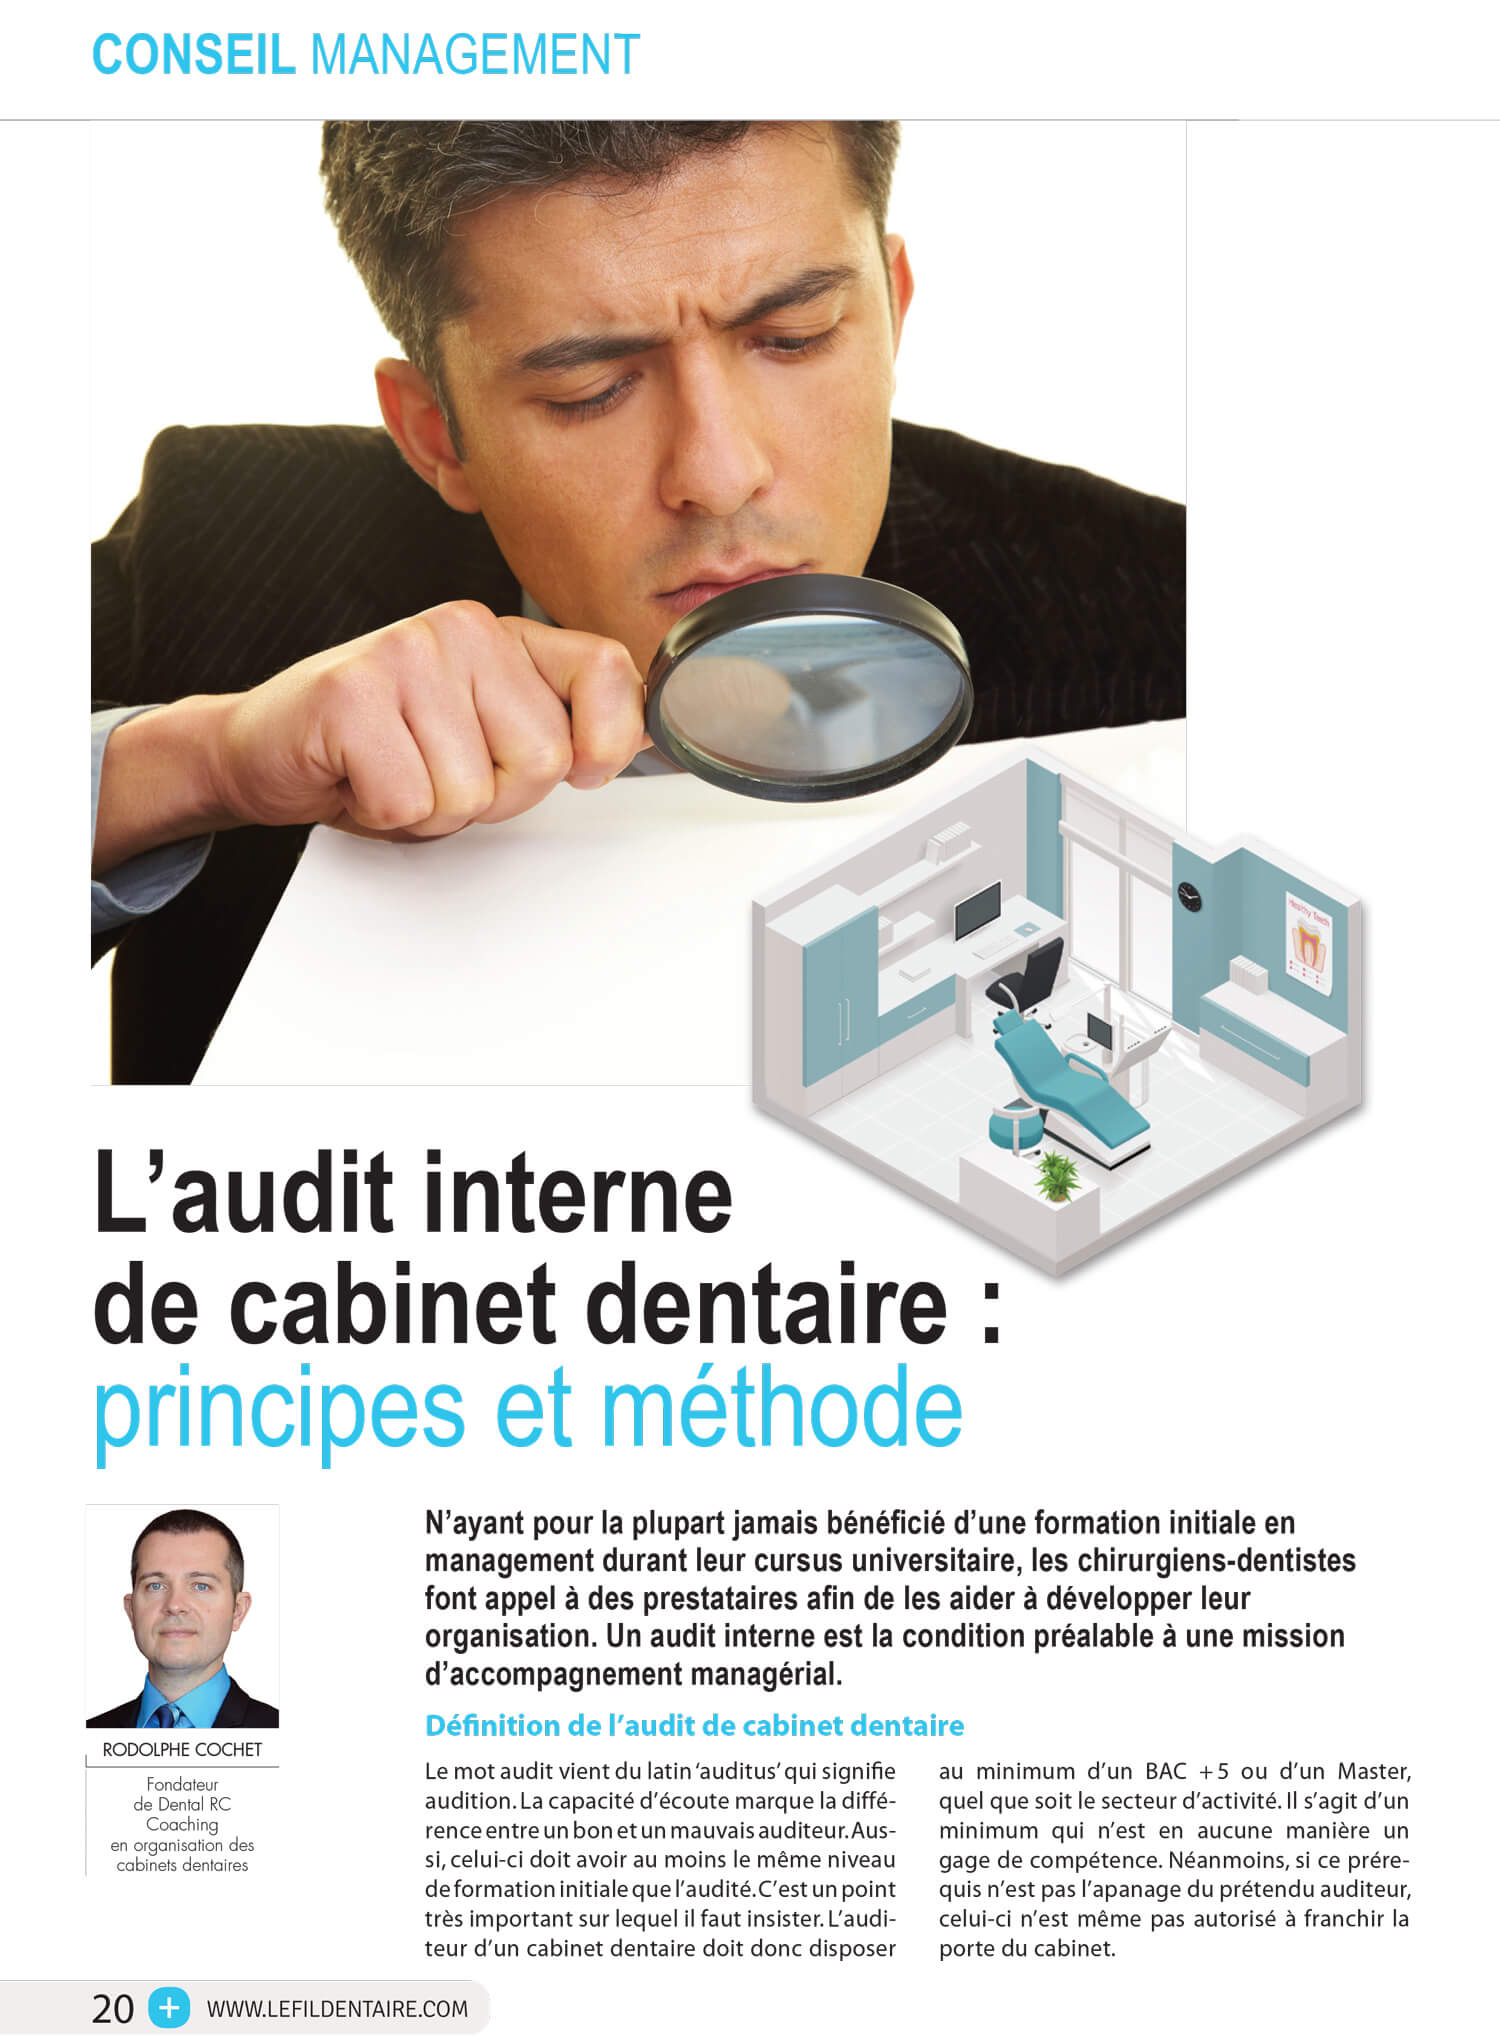 audit-interne-cabinet-dentaire-coaching-methode-principes-rodolphe-Cochet.jpg